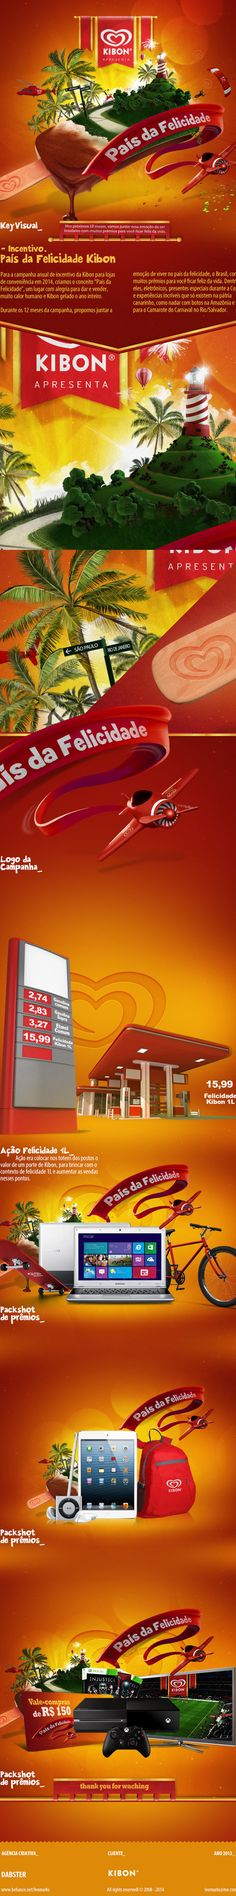 Campanha País da Felicidade Kibon by Leo Marks, via Behance Ad Design, Layout Design, Print Design, Packaging Design, Branding Design, Instagram Schedule, Poster Ads, Web Layout, Creative Advertising